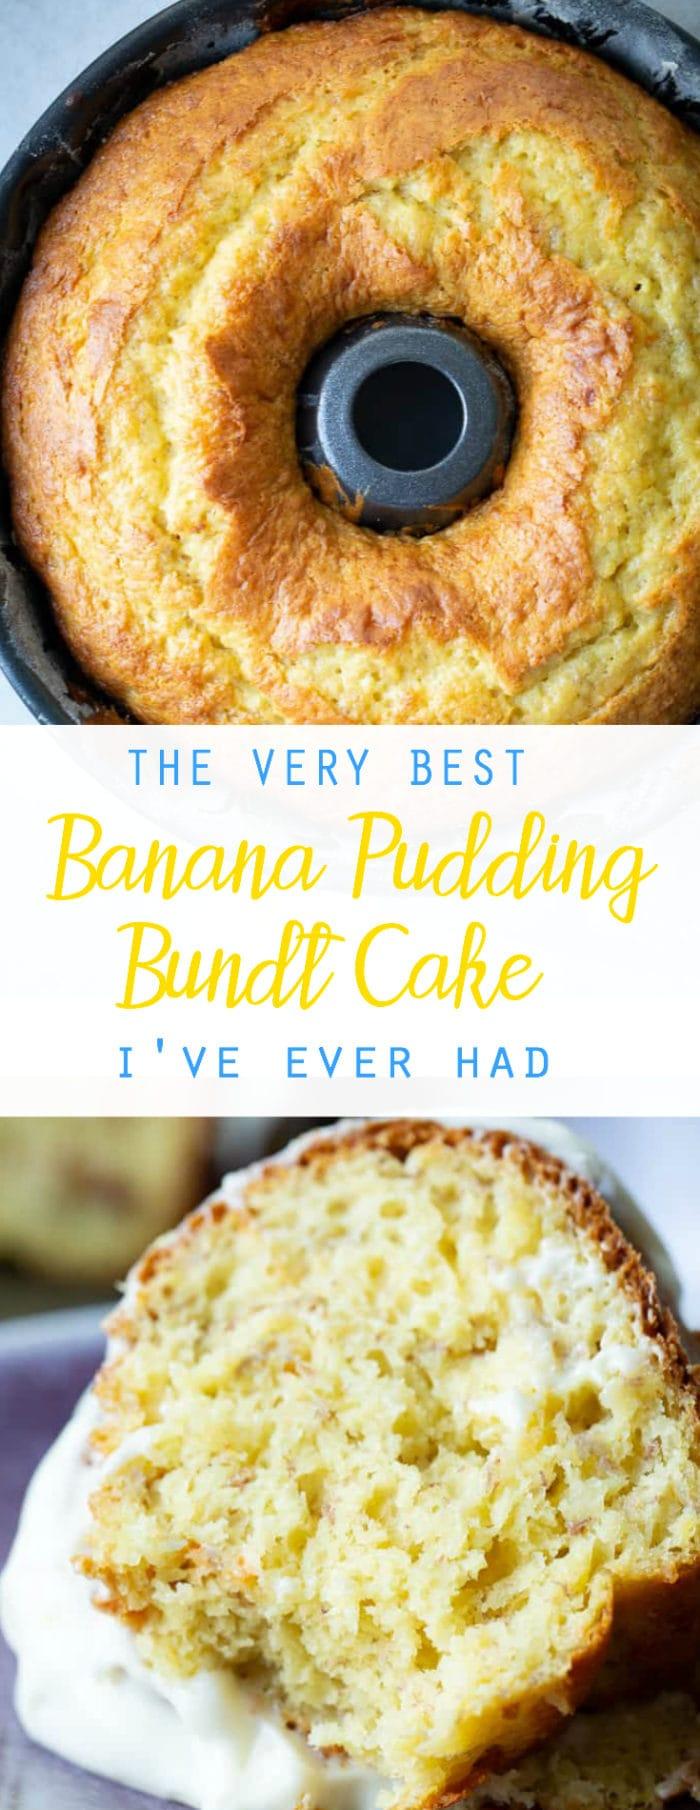 A dark bundt pan with a beautiful, bright yellow banana pudding bundt cake